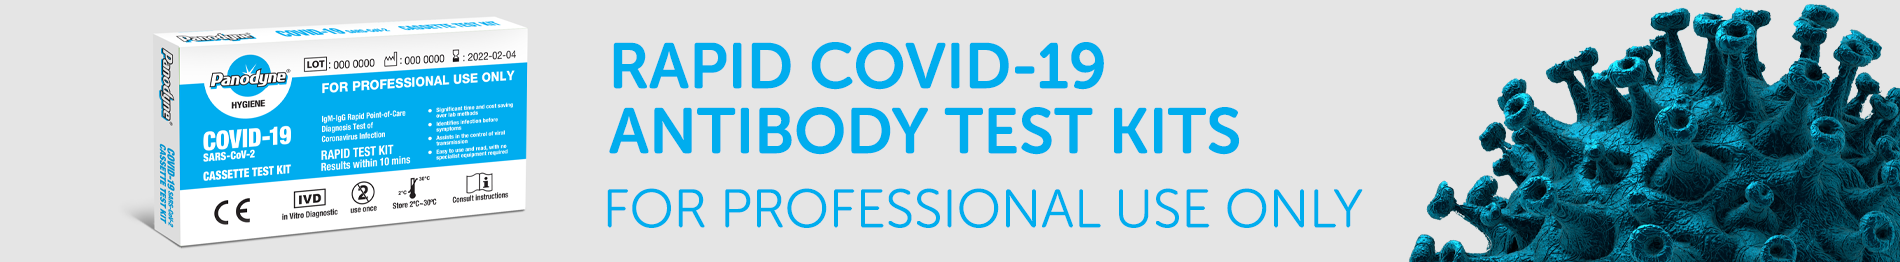 Rapid COVID-19 Antibody Test Kit